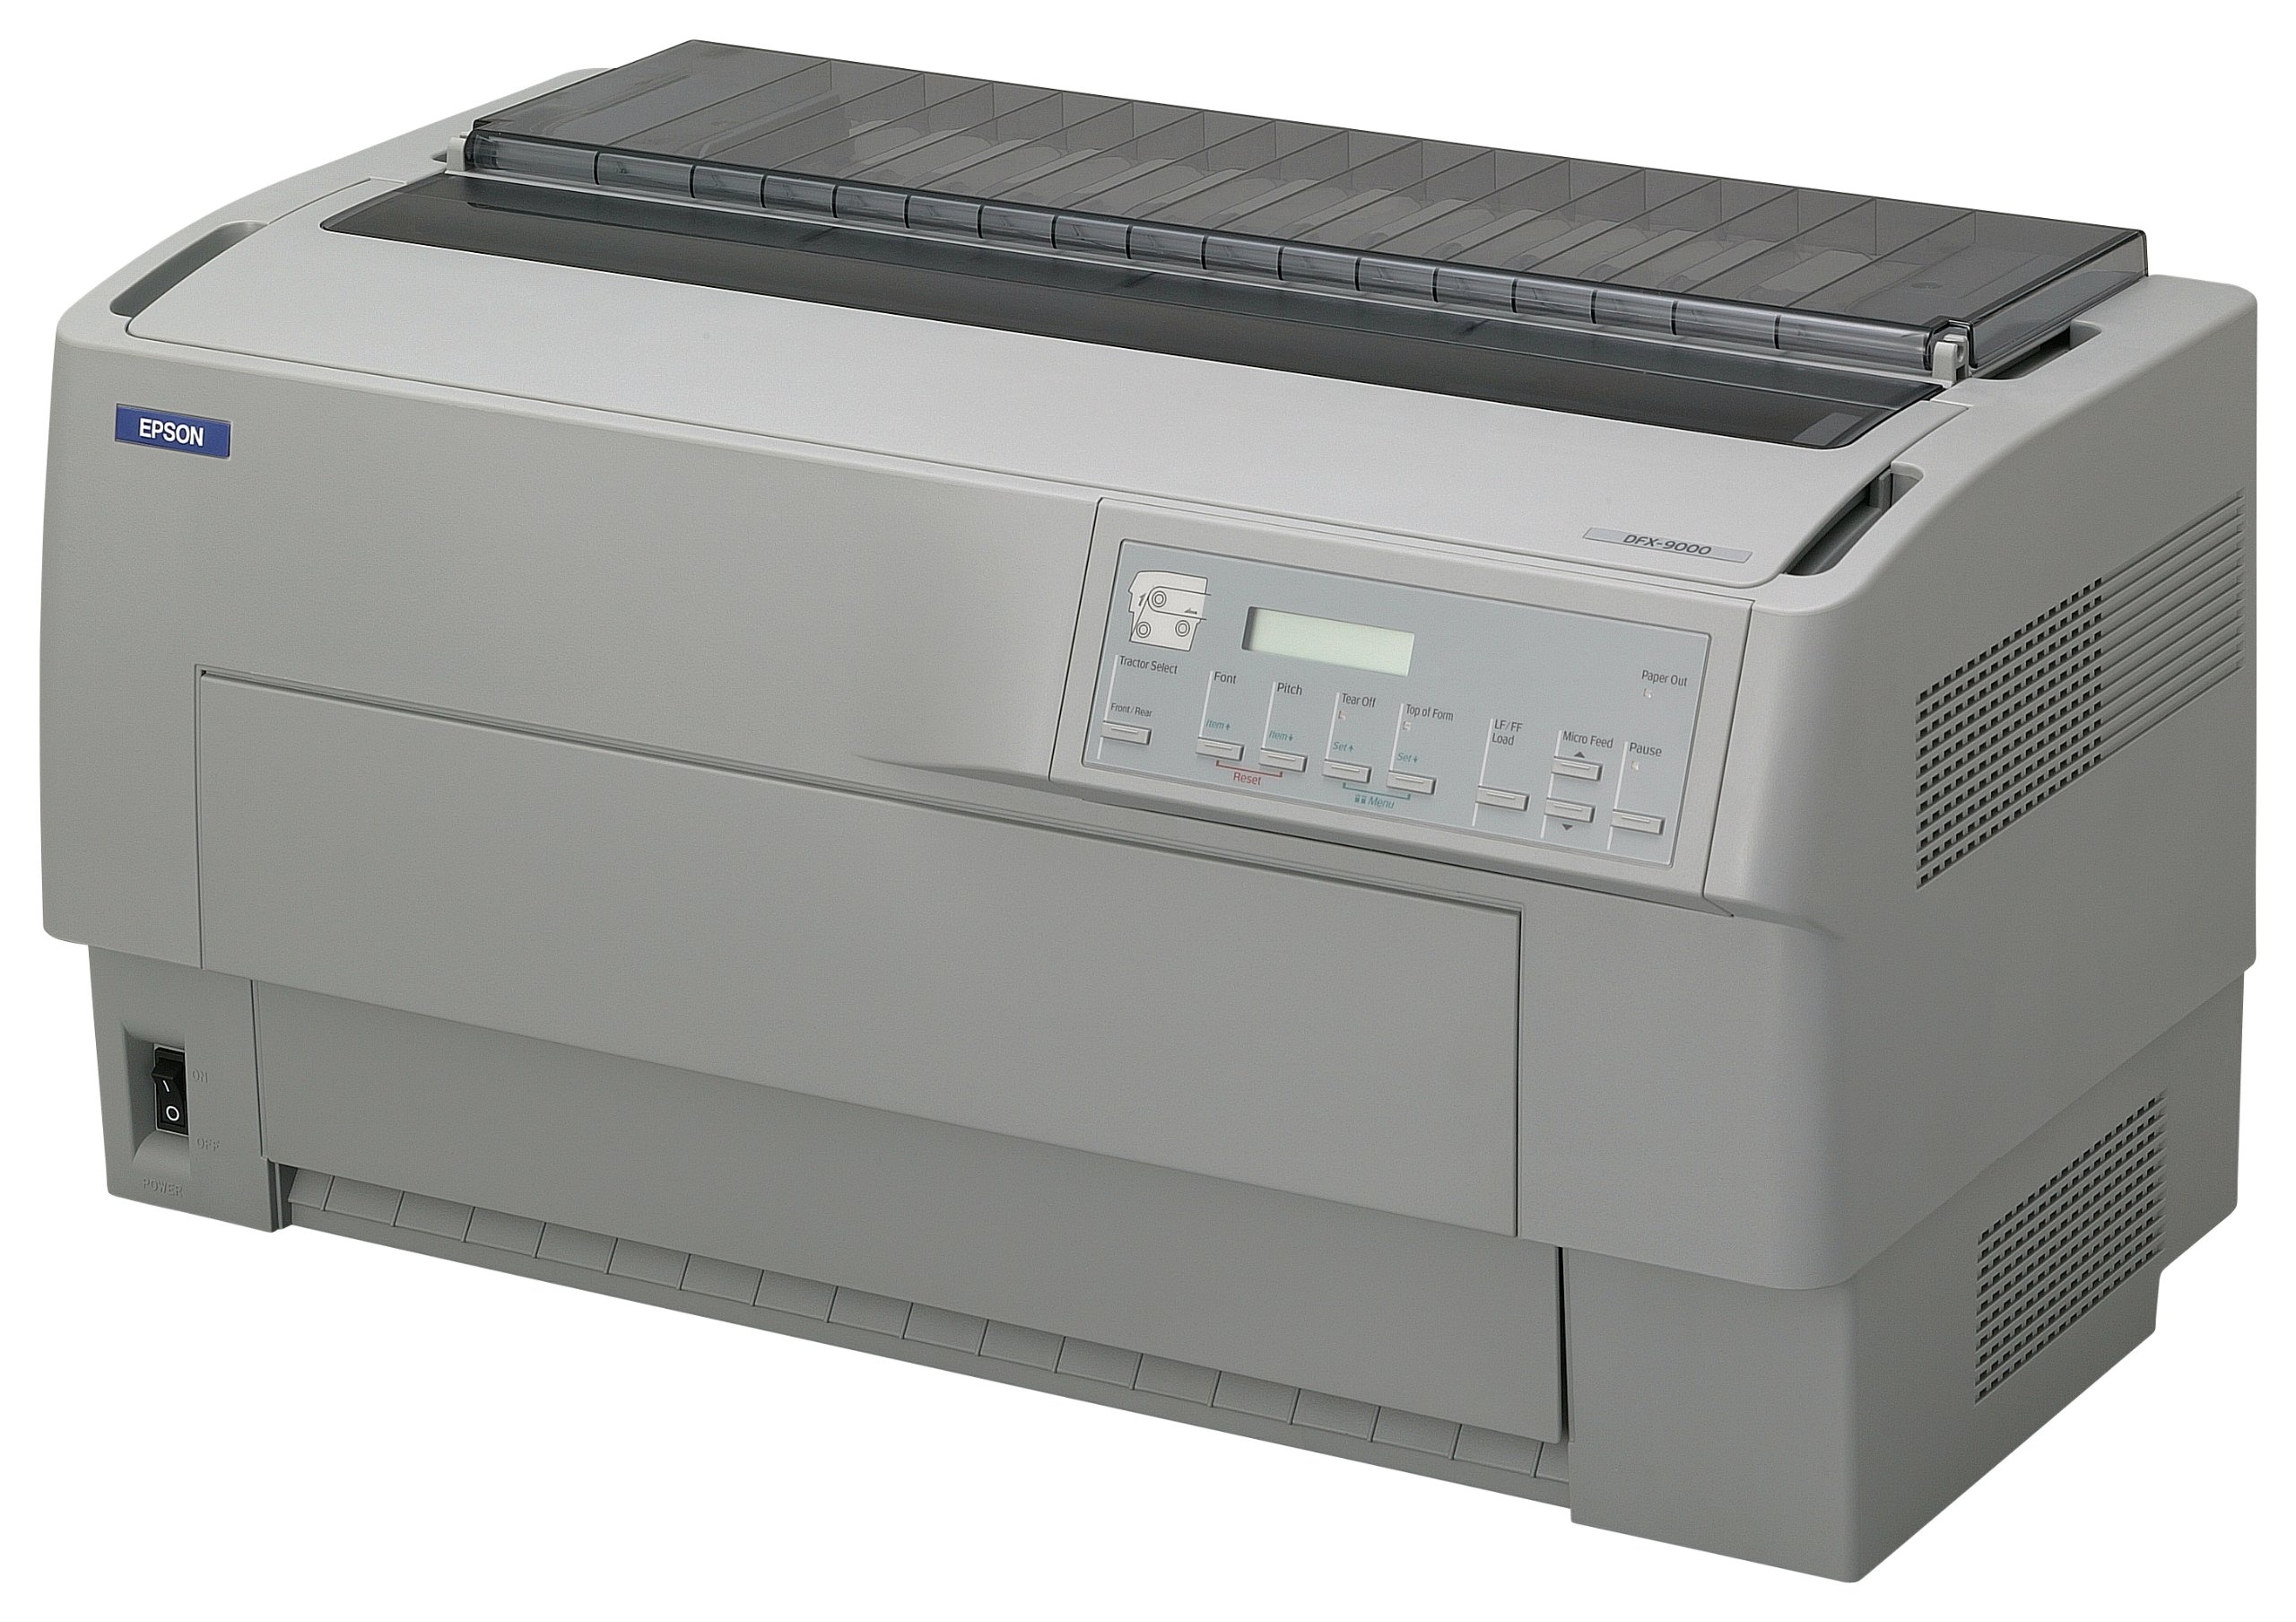 Epson C11C605001 DFX-9000 Wide Format Impact Printer by Epson (Image #1)